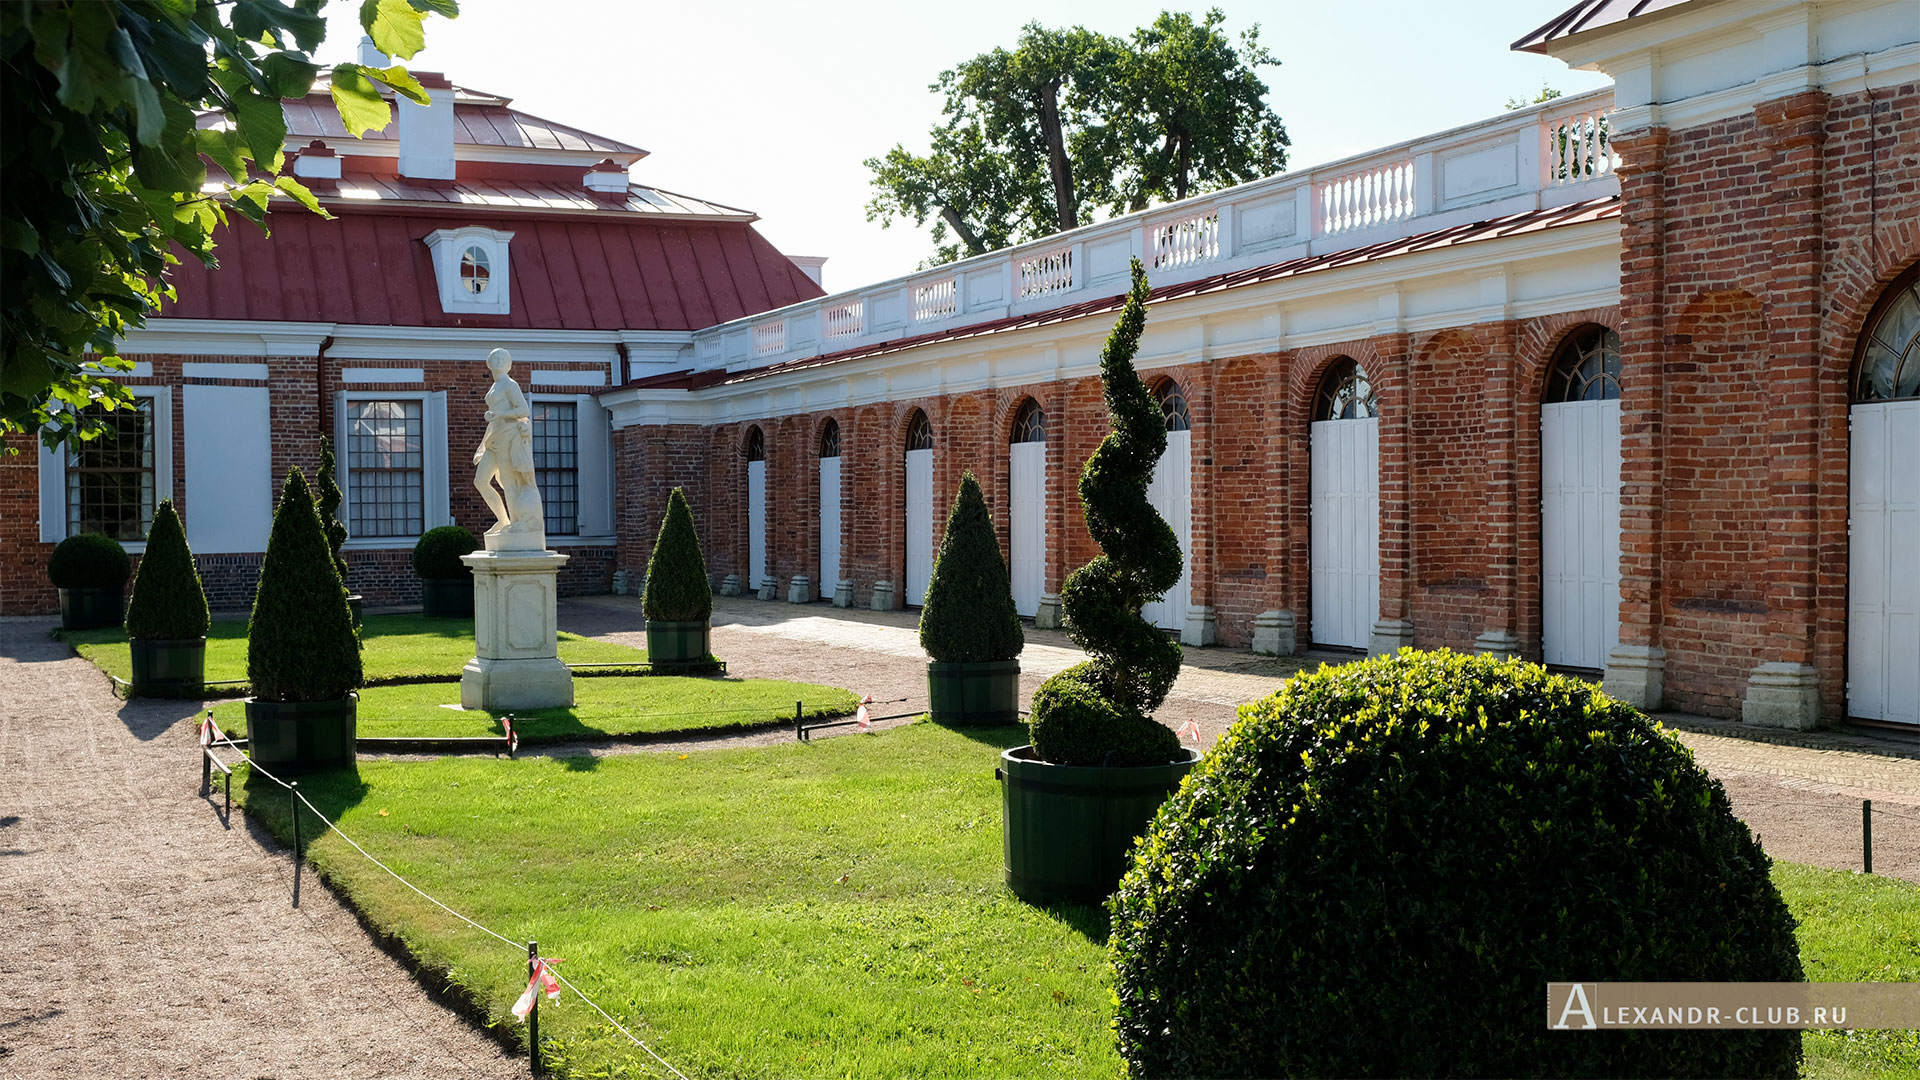 Петергоф, лето, Нижний парк, дворец «Монплезир»